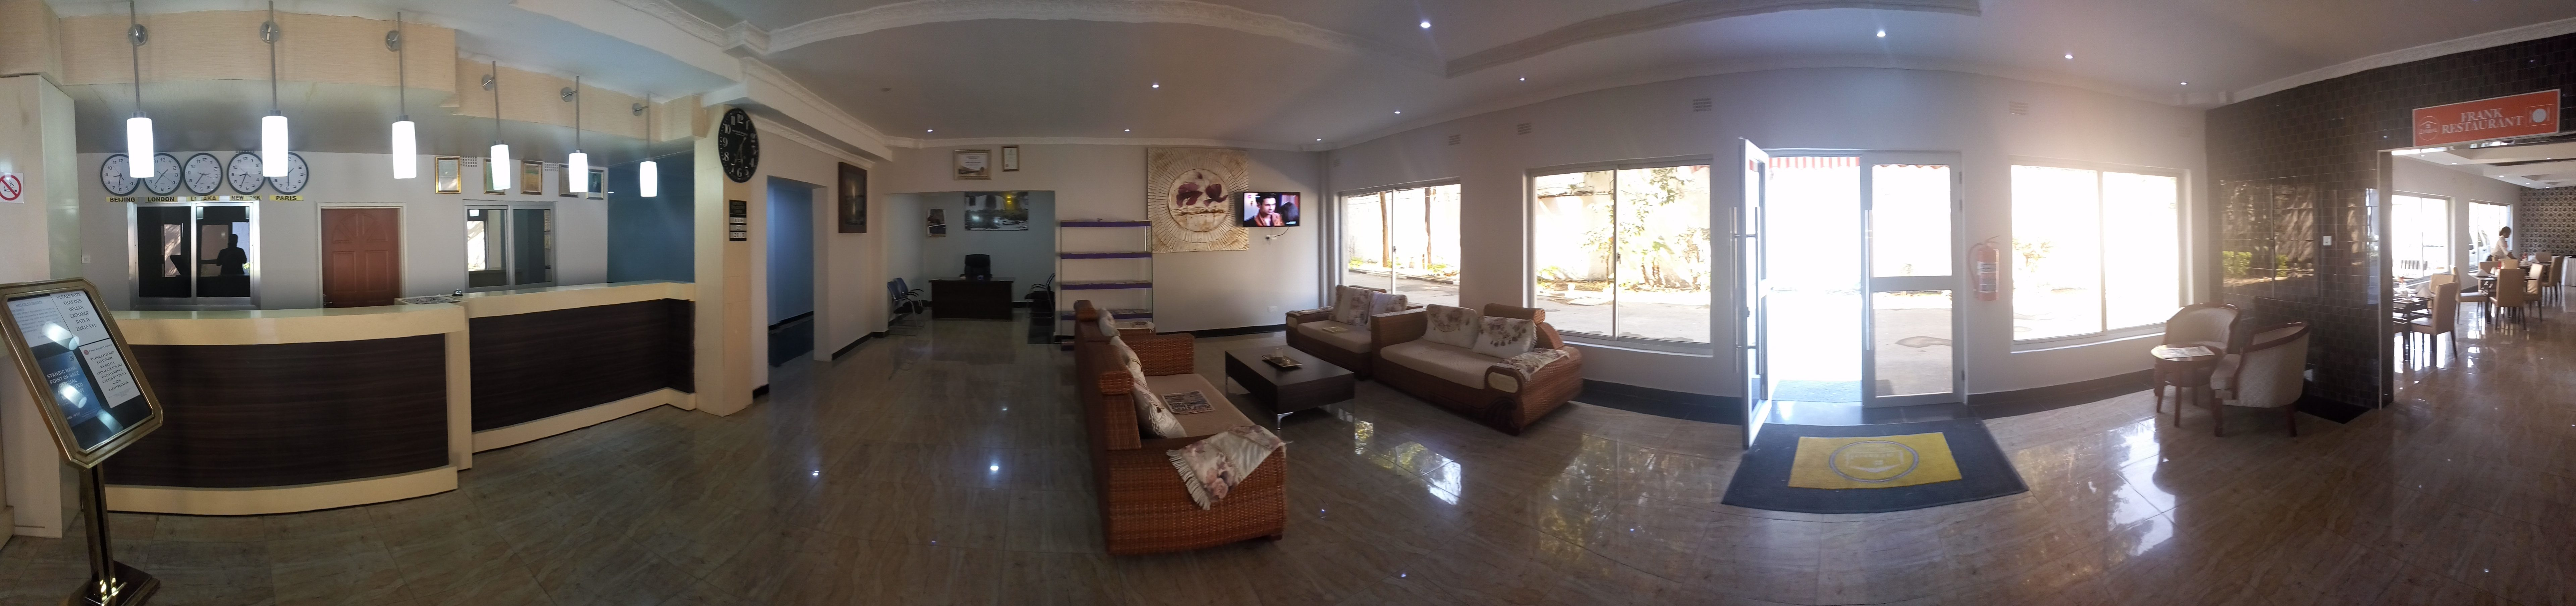 Reception Panorama